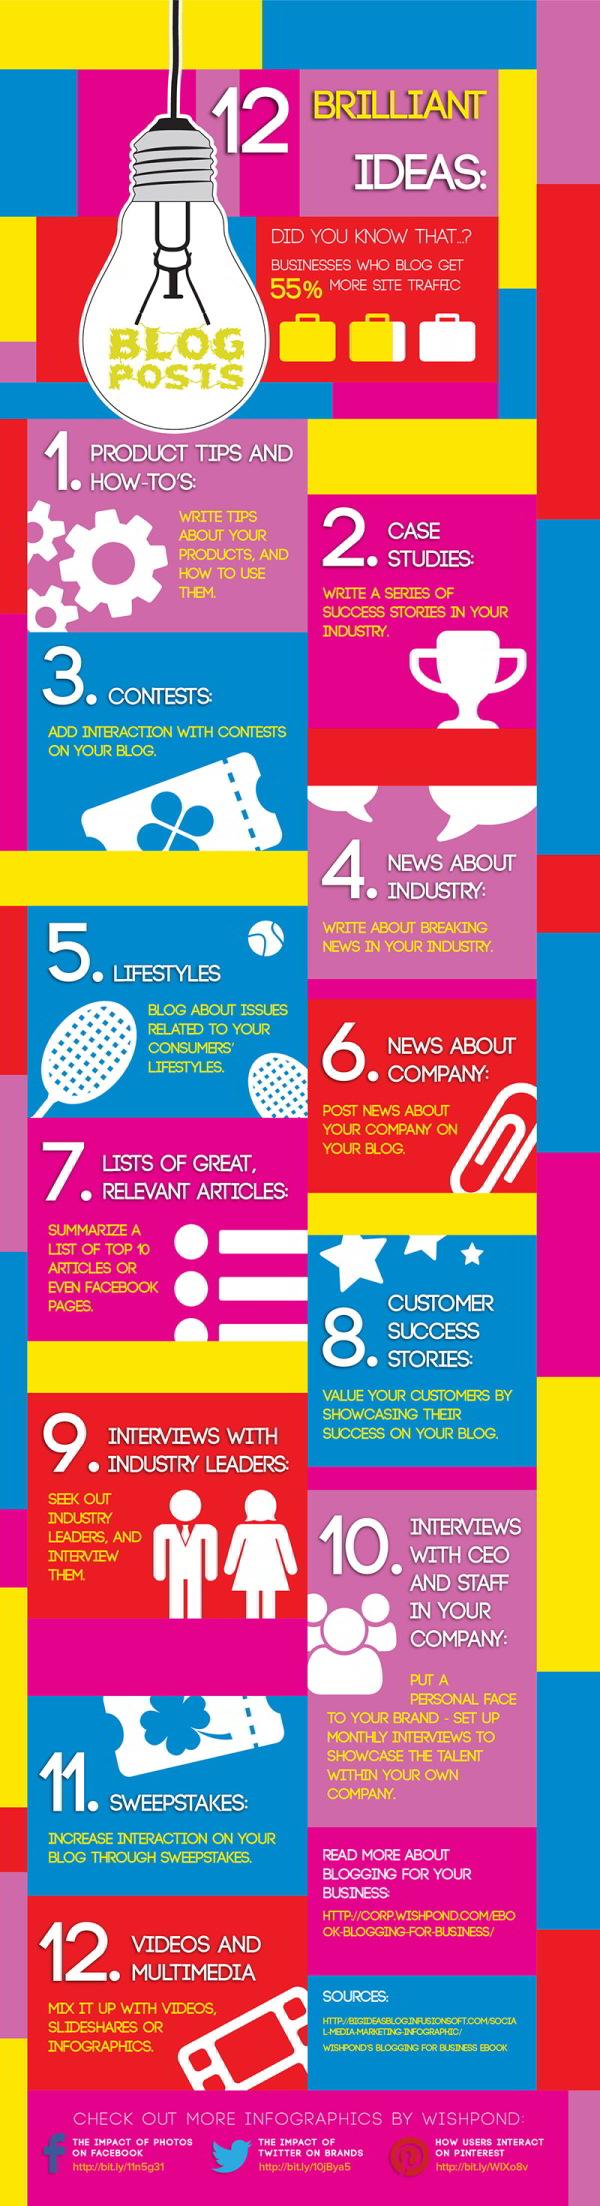 Blog d entreprise 12 id es de billets choblab for Idee entreprise internet